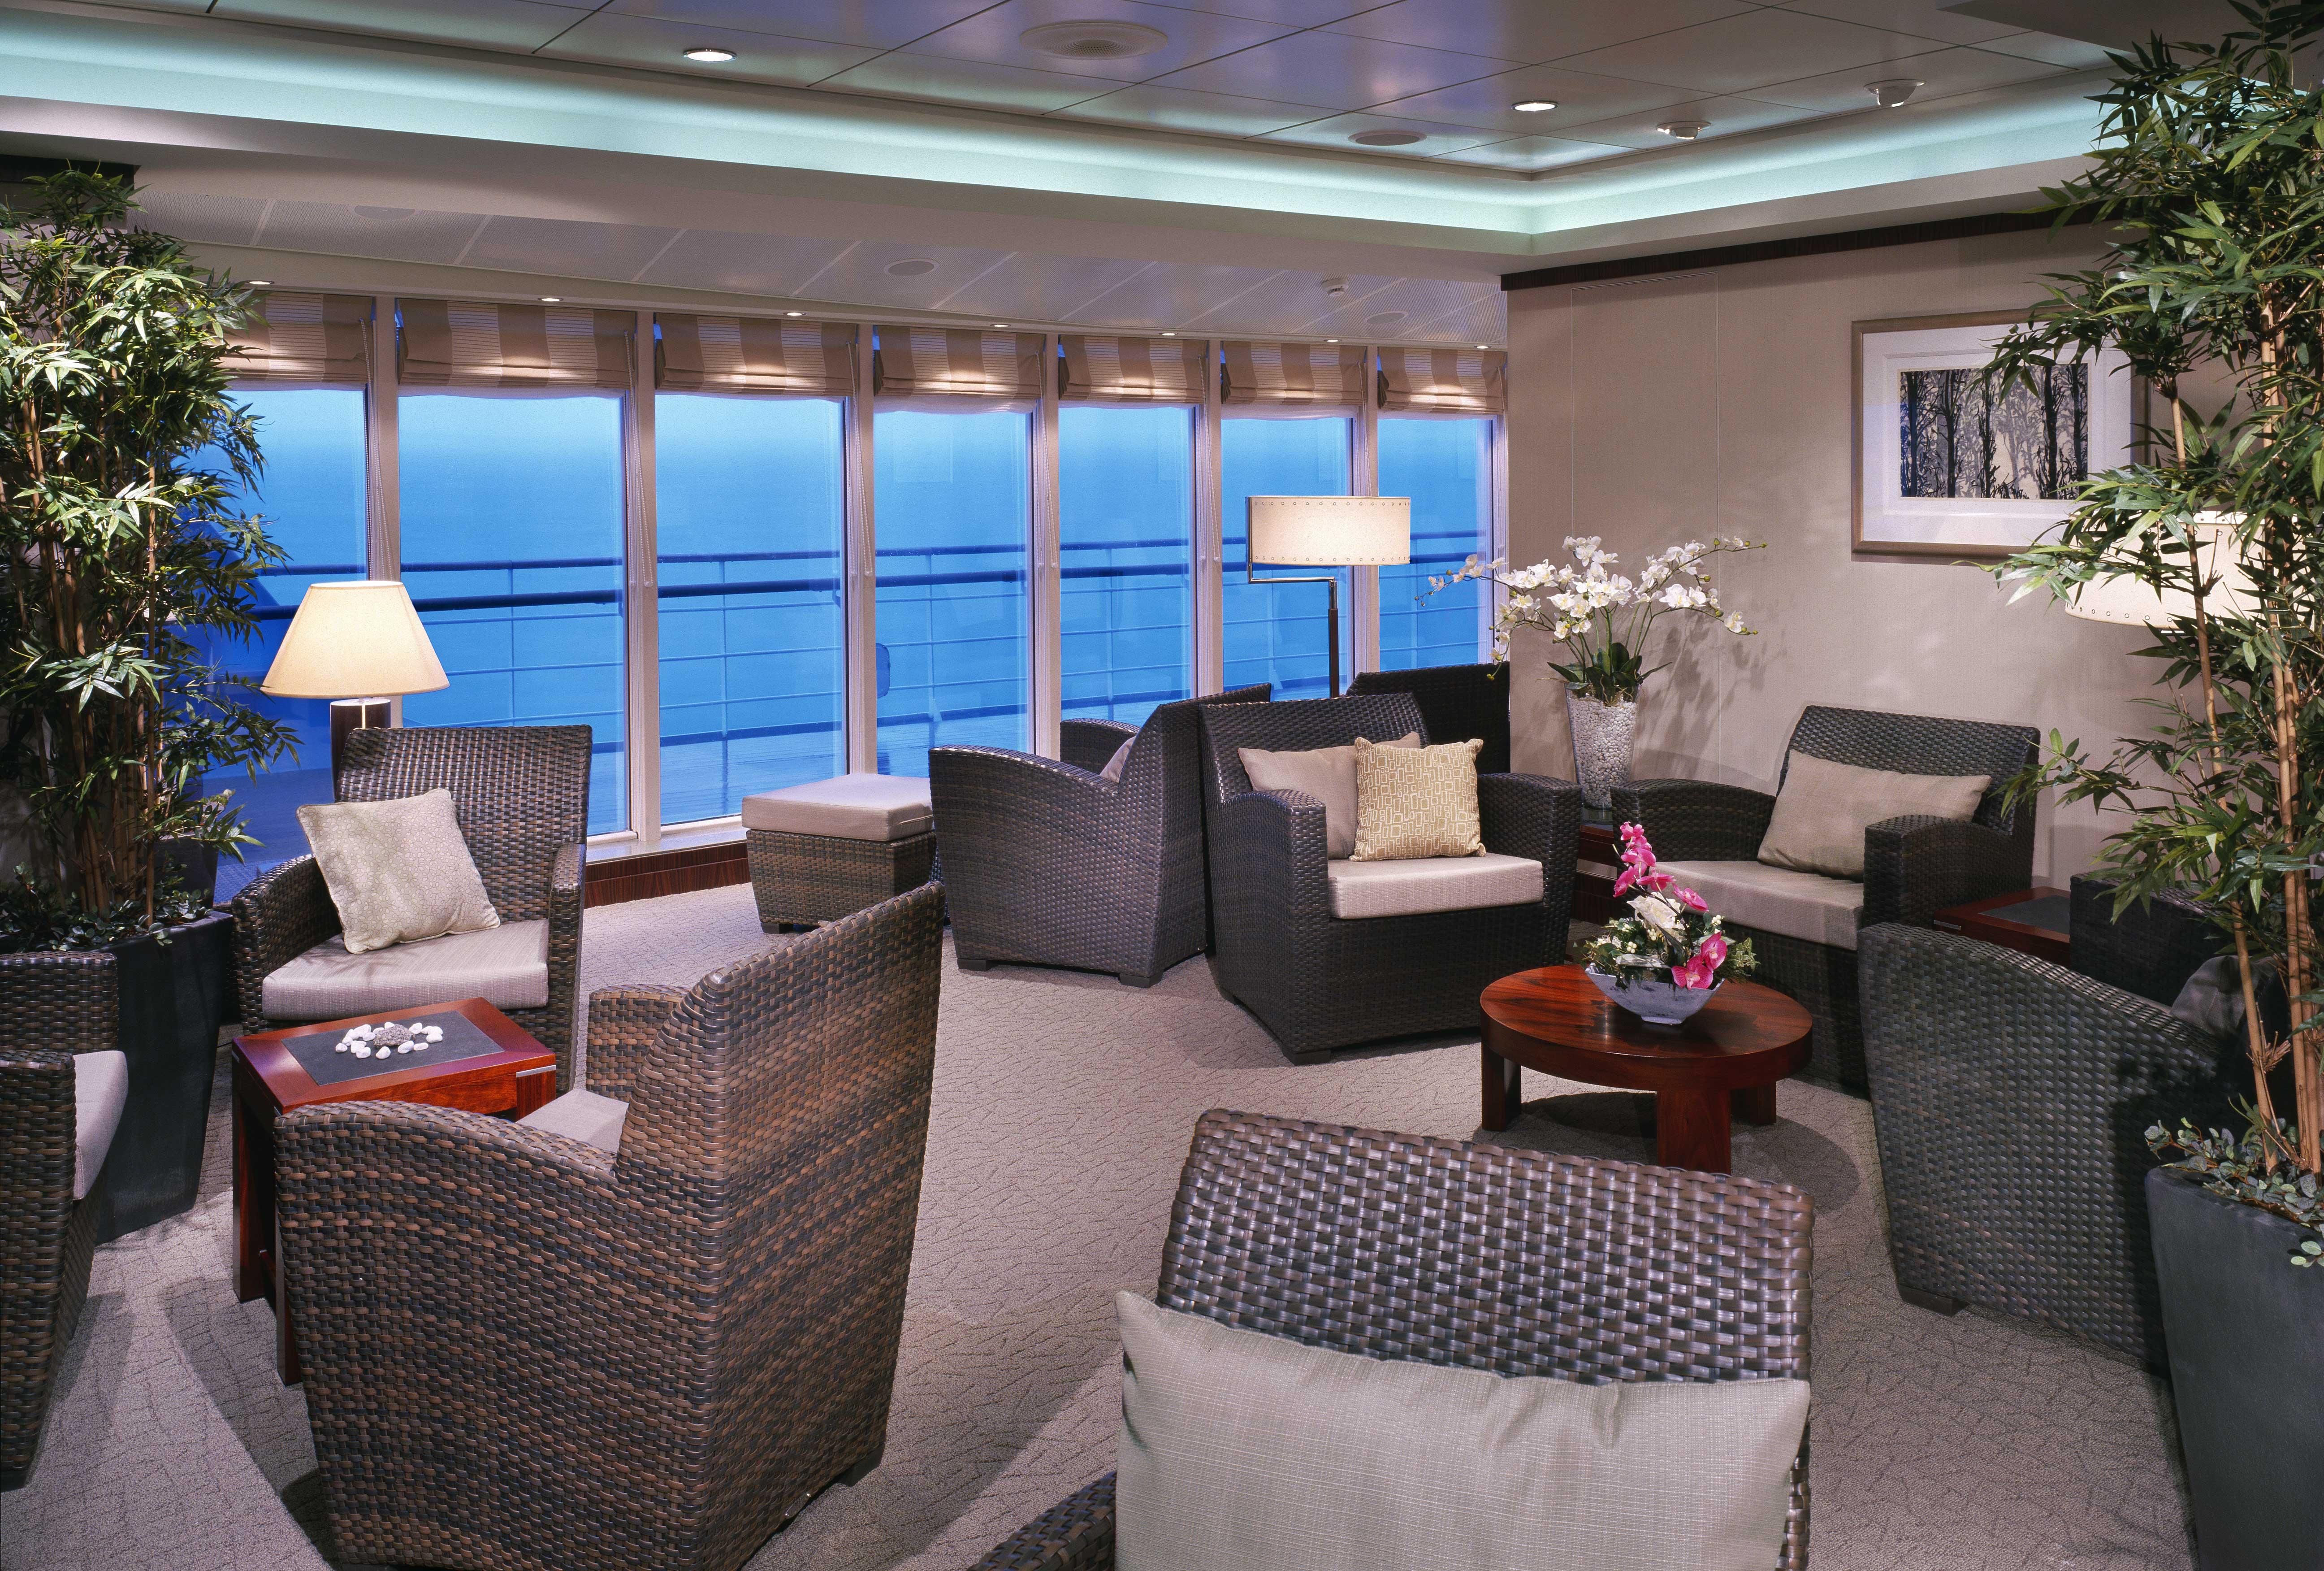 Cunard Line Queen Mary 2 Canyon Ranch Spa 2.JPG